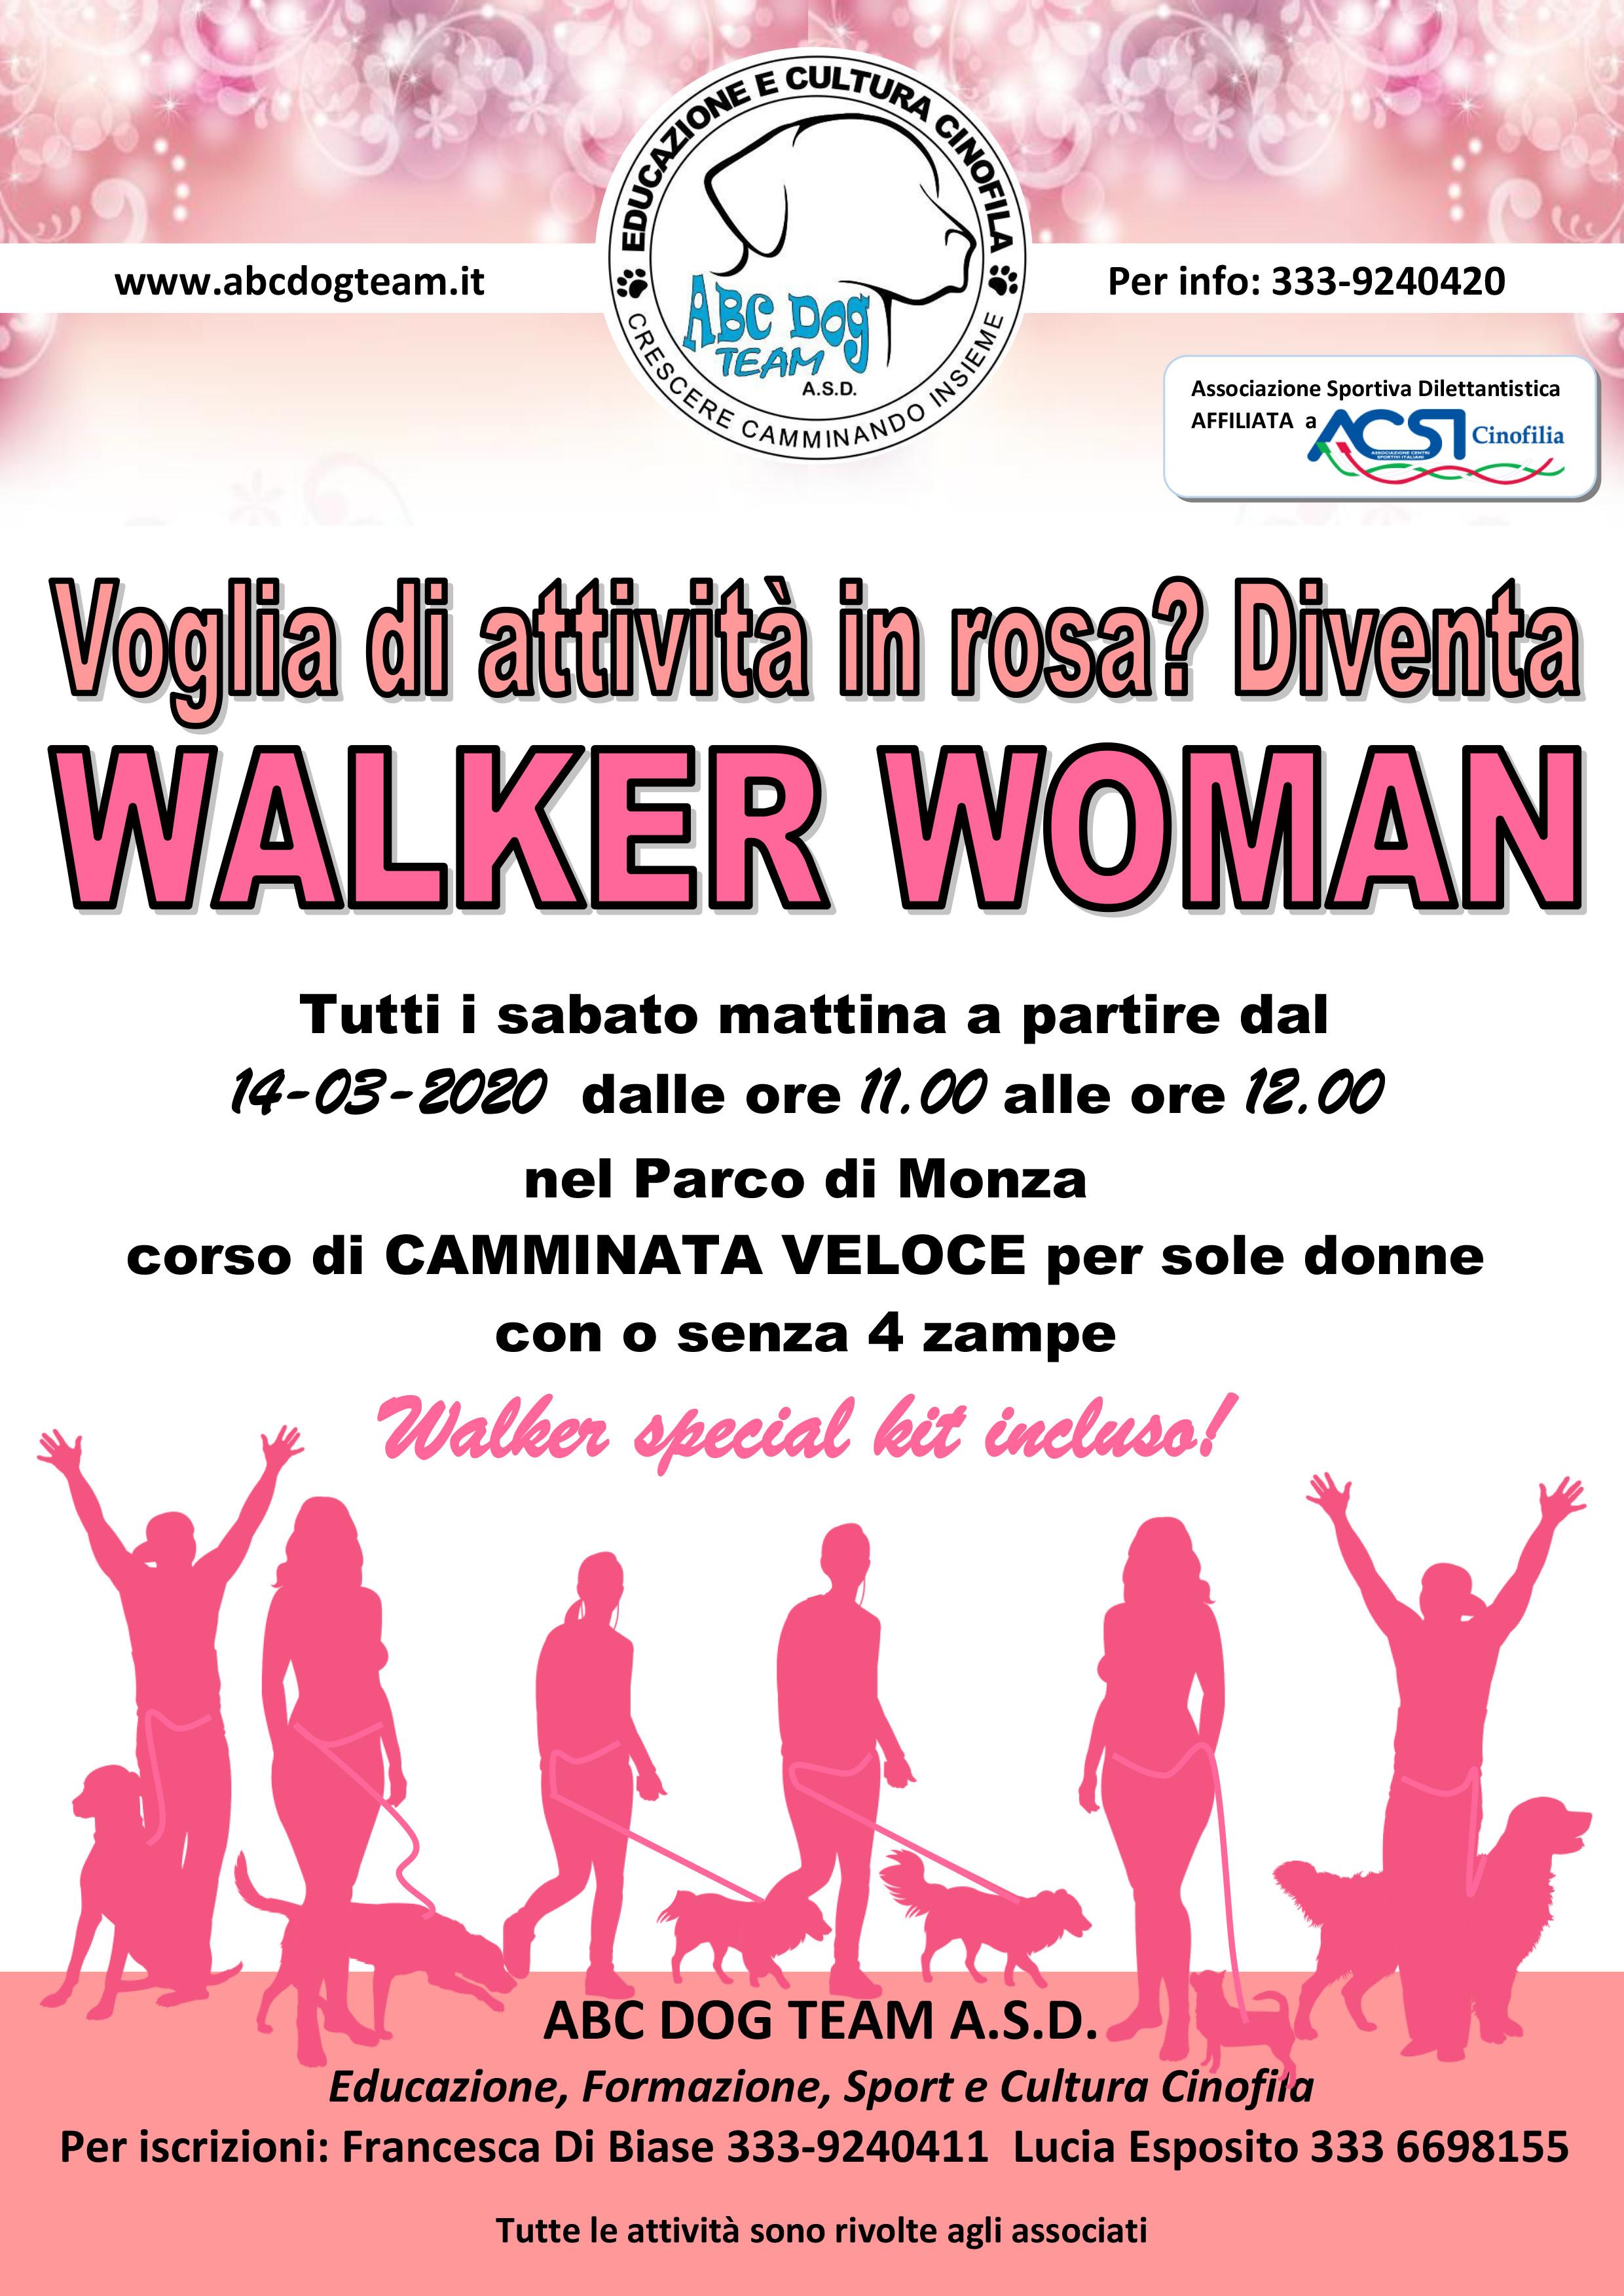 Abc Dog Team WALKER WOMAN 2020